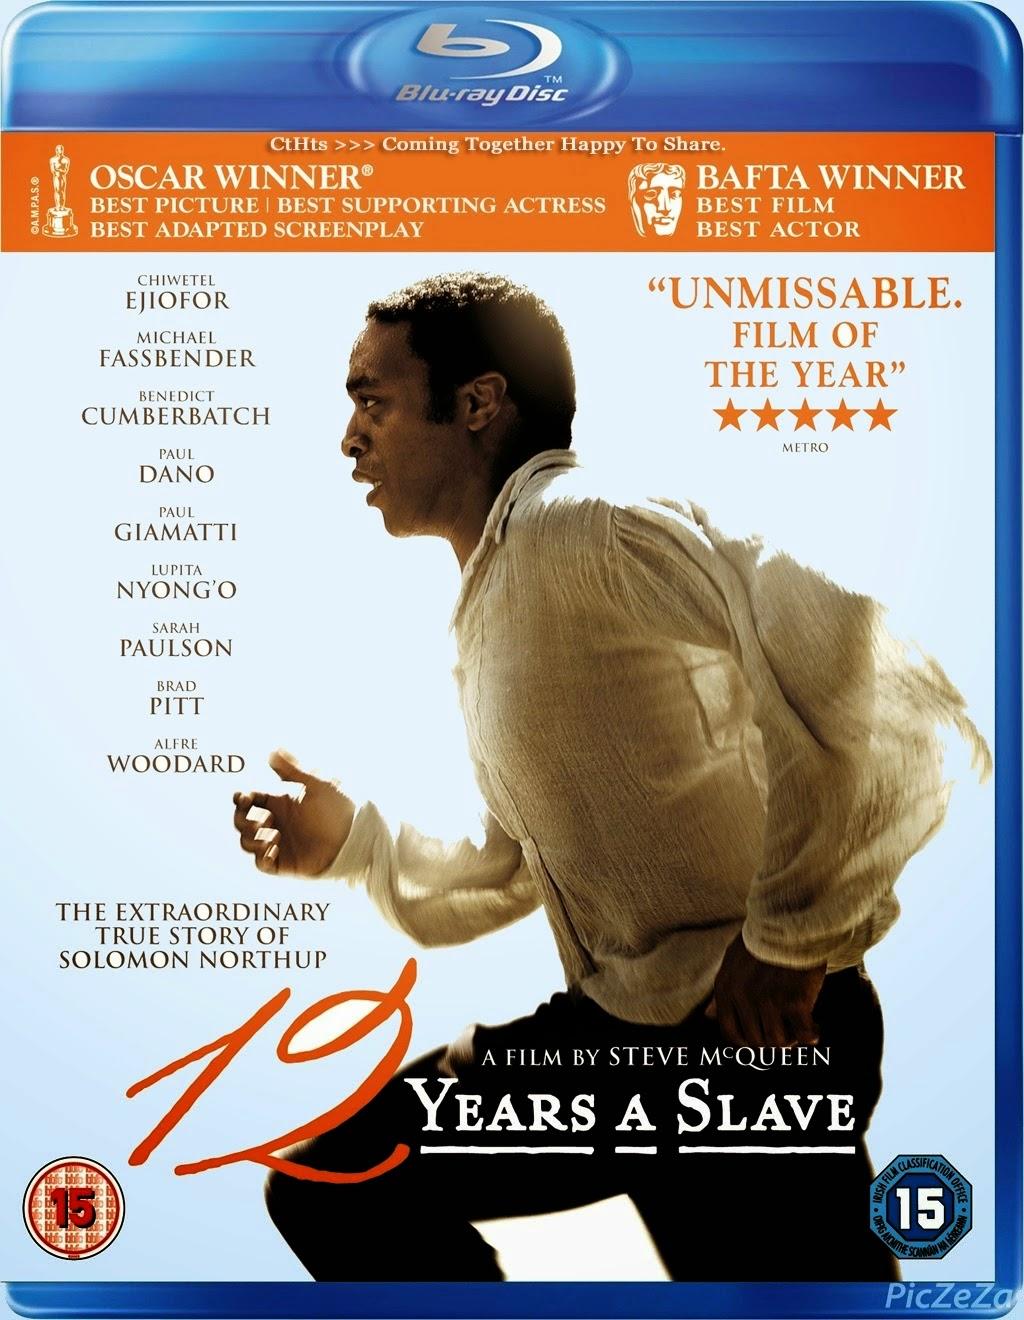 12 Years A Slave (2013) : ปลดแอกคนย่ำคน